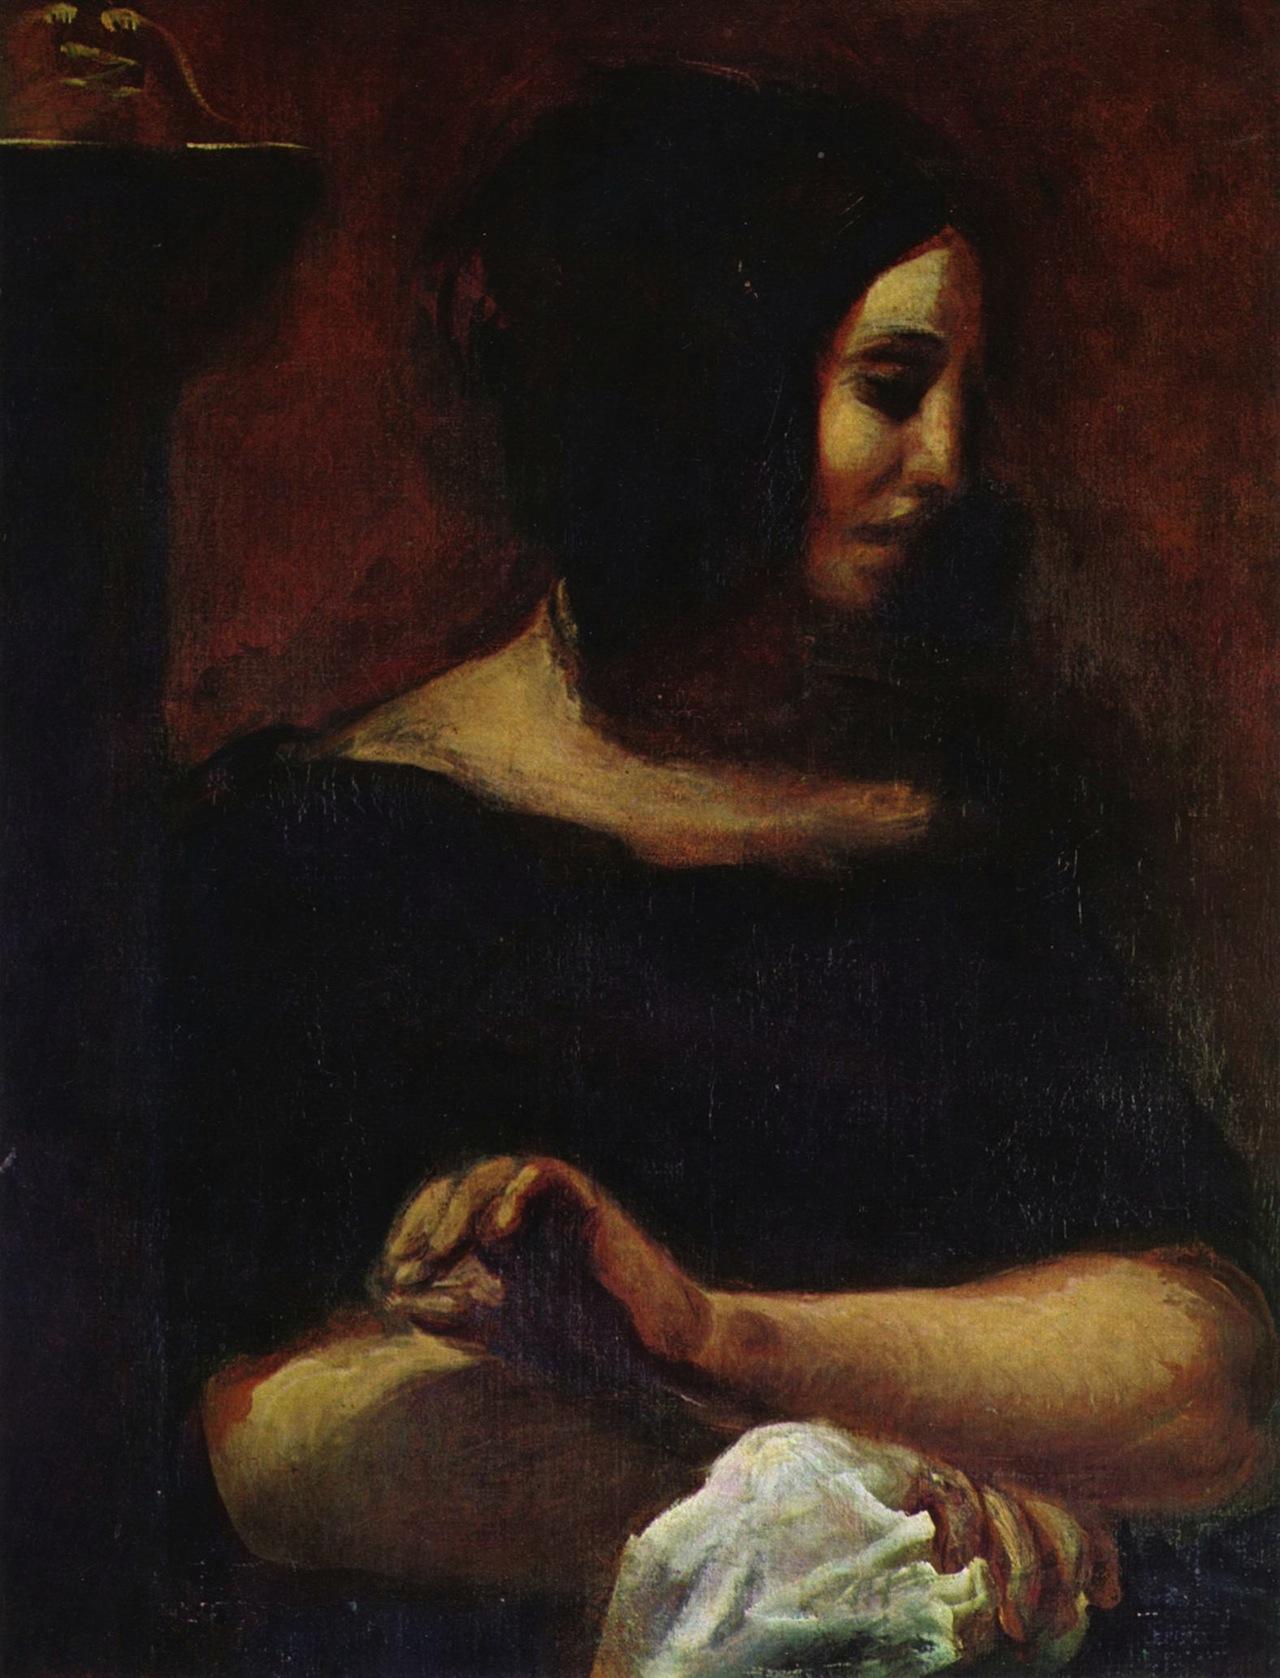 Delacroix's portrait of George Sand (Image via Wikimedia)